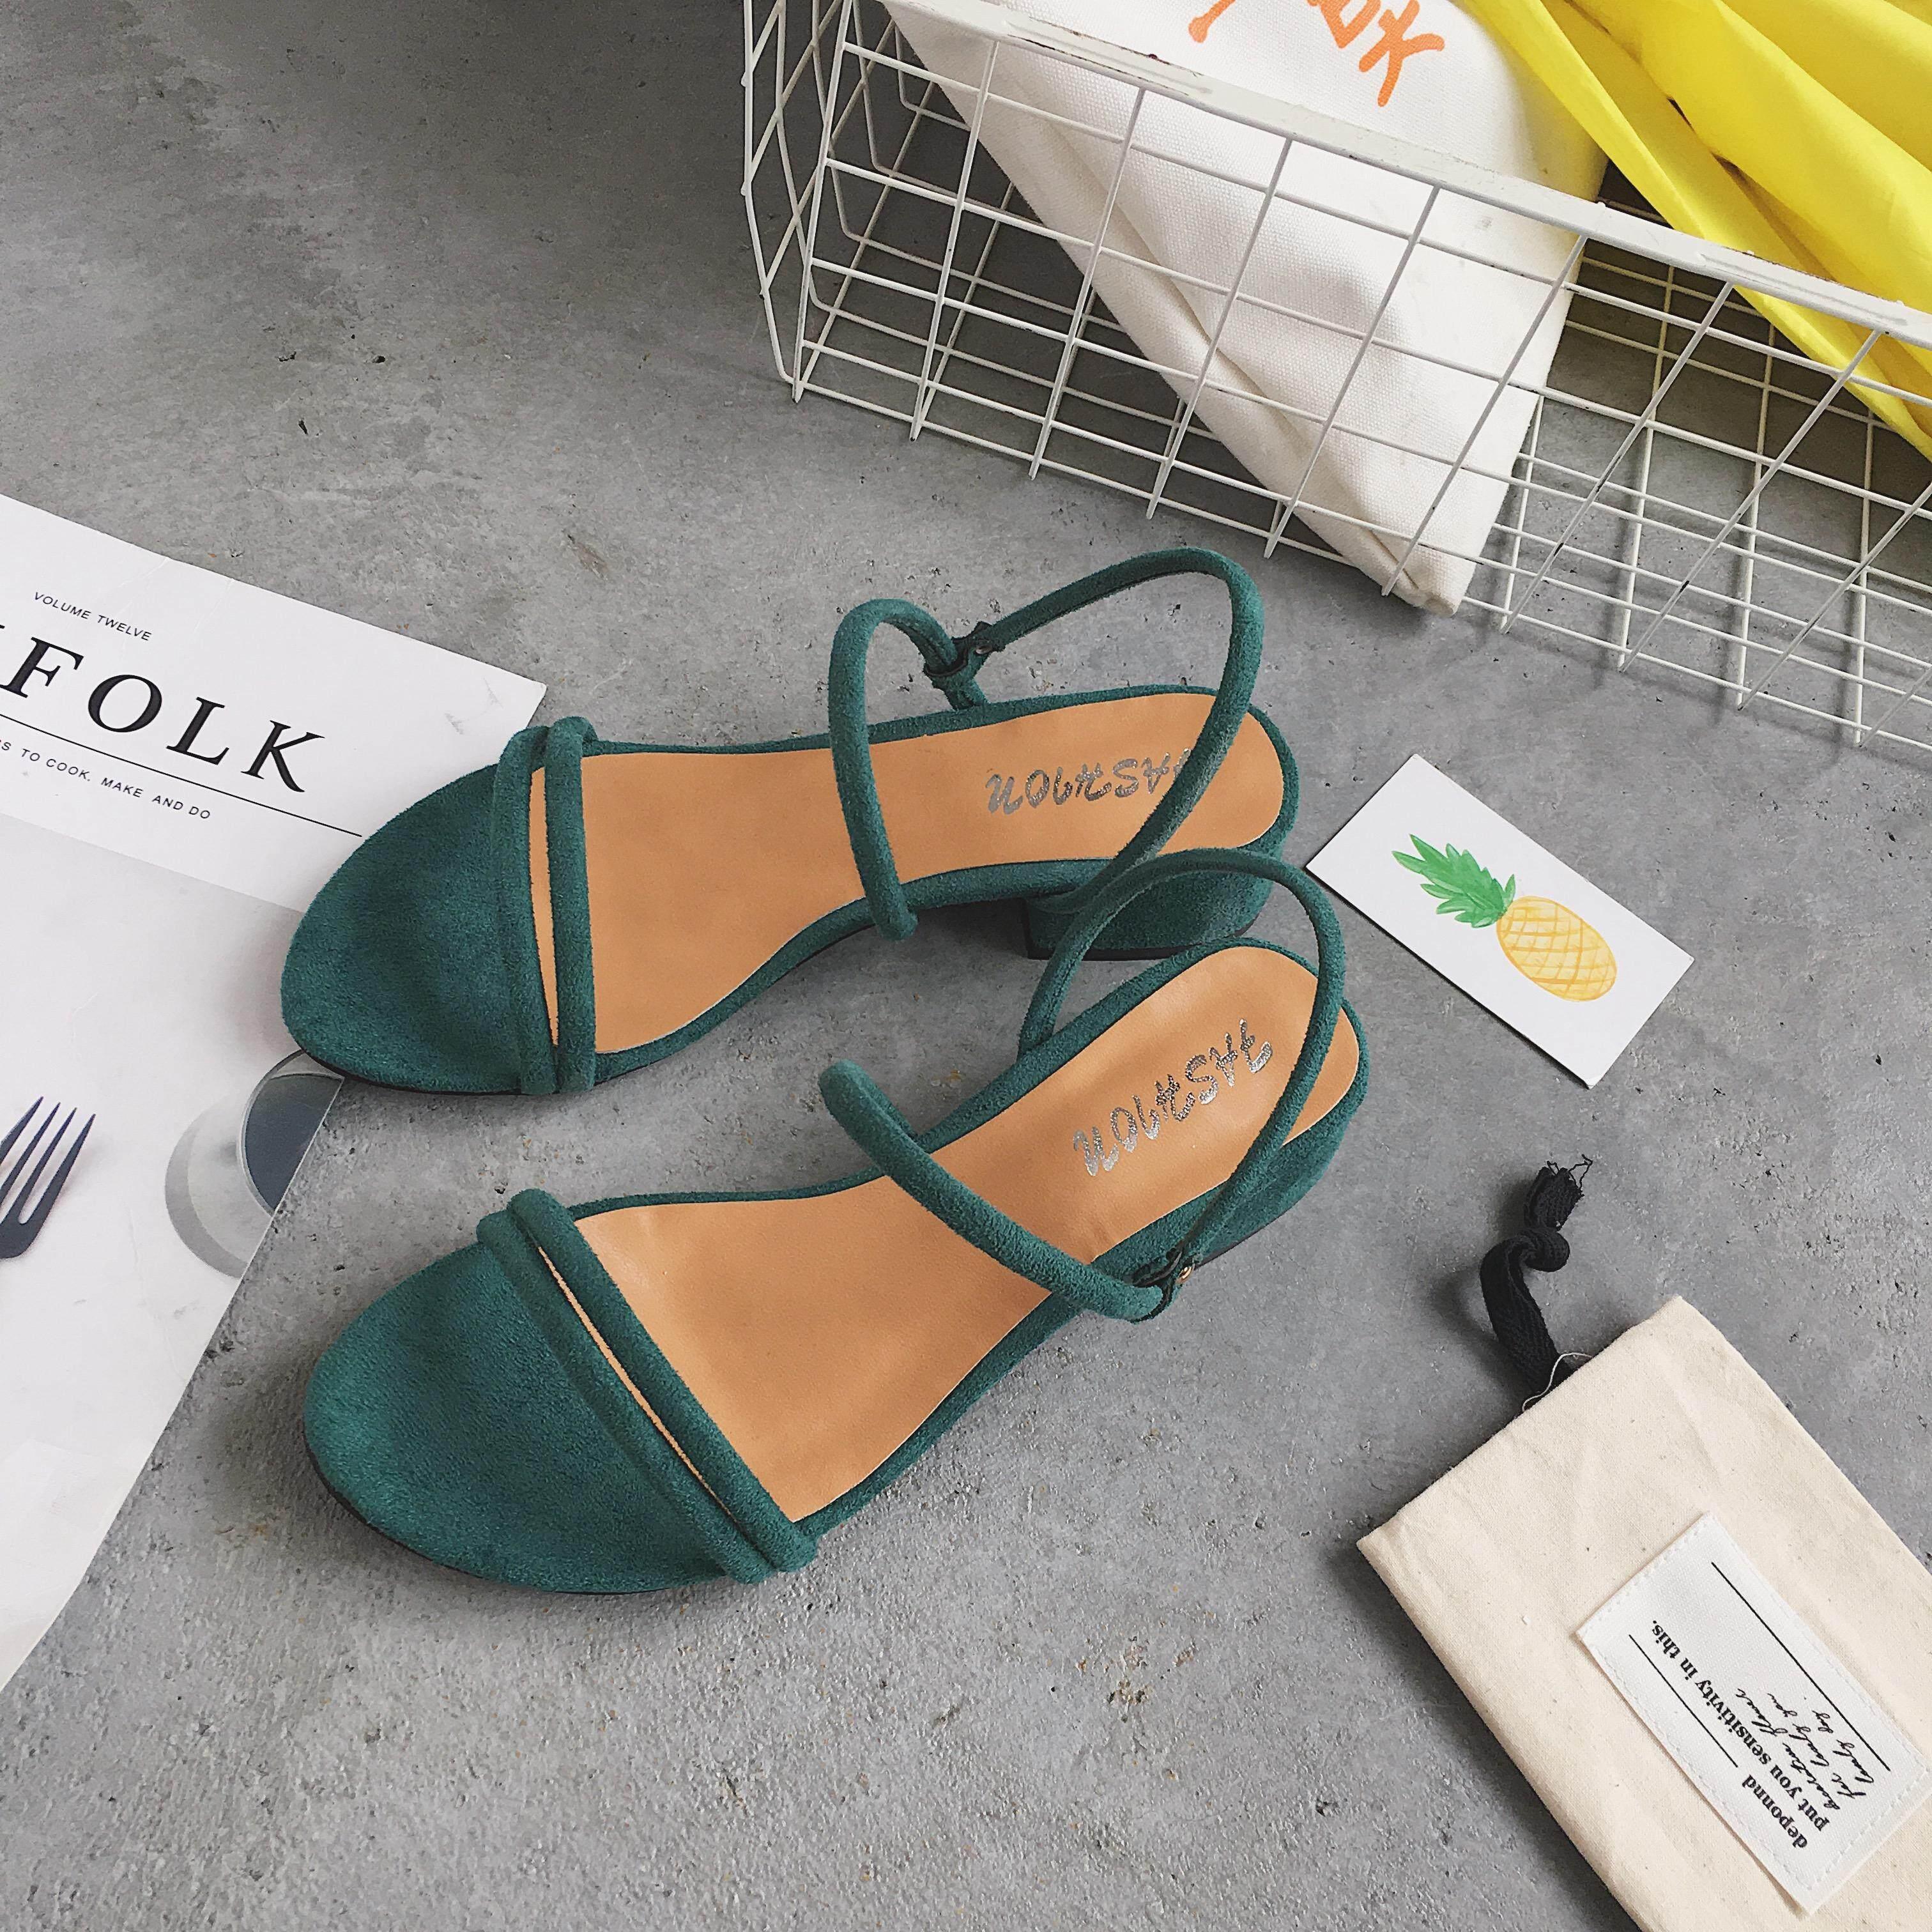 2d5850bed9f82 2018 New Style Semi-high Heeled A-line Sandals women Summer Korean Style  Versatile